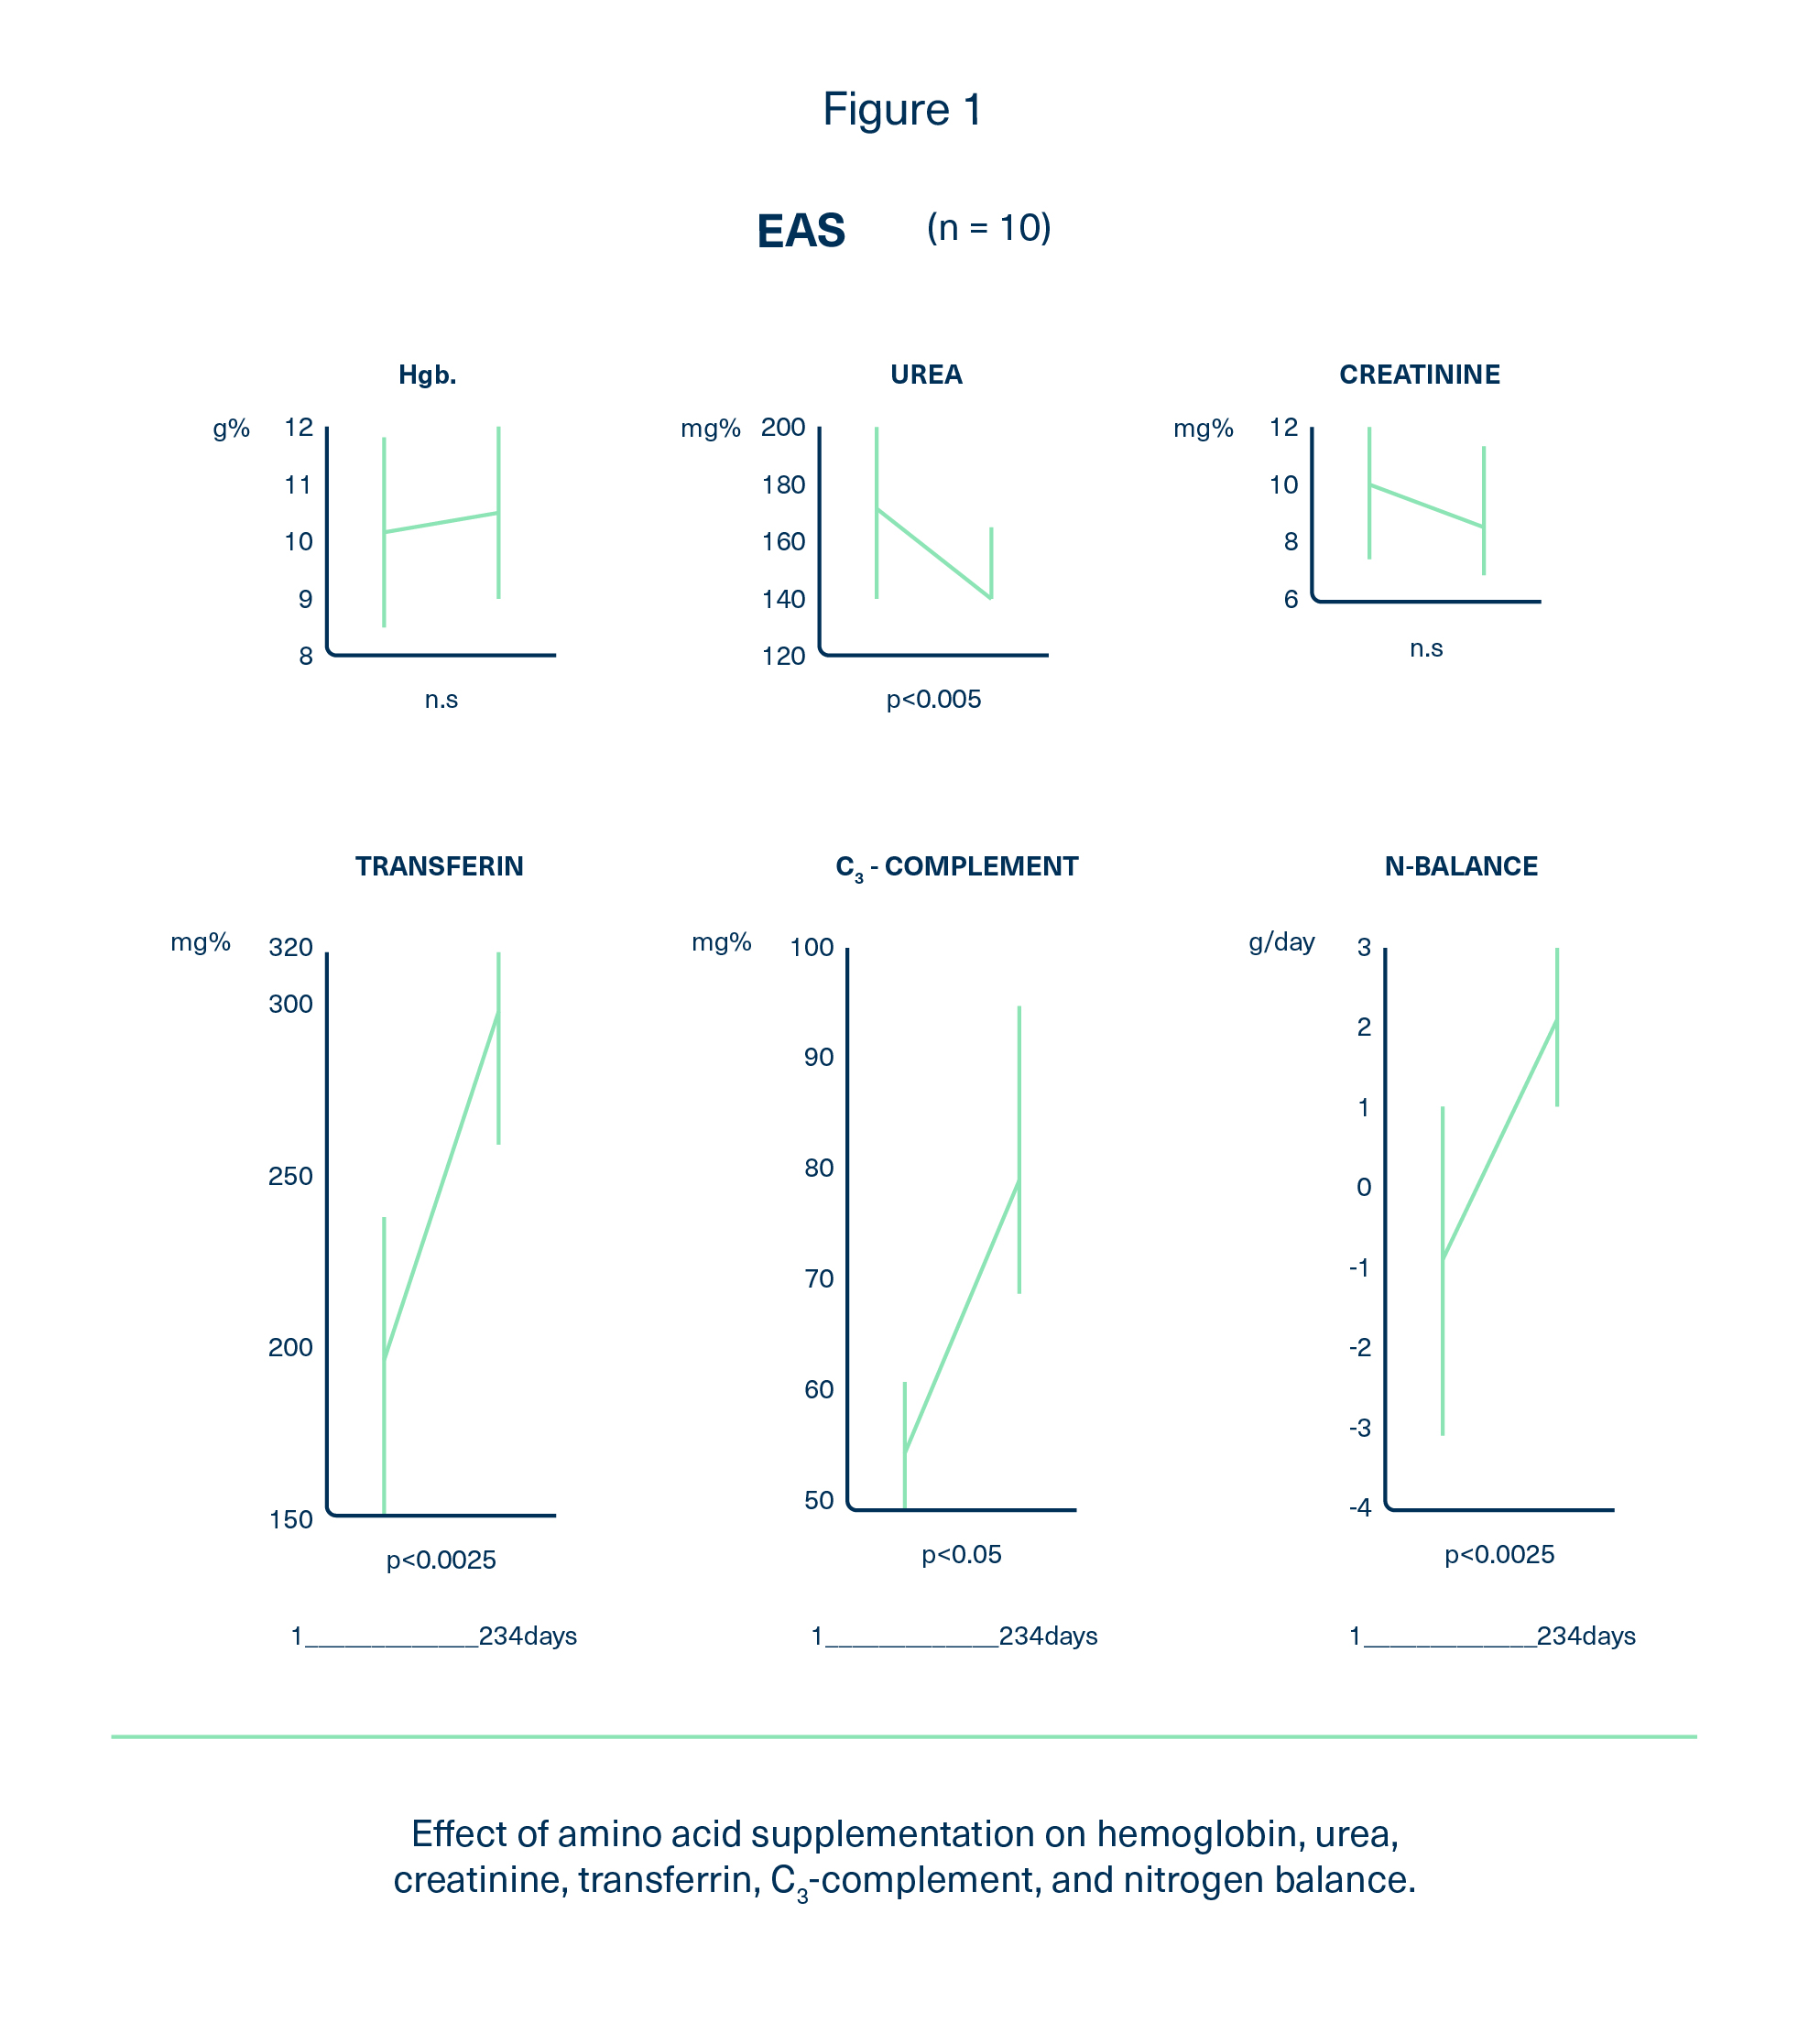 Effect of Amino Acid Supplementation On Hemoglobin, Urea, Creatinine, Transferrin, C3-complement and Nitrogen Balance.